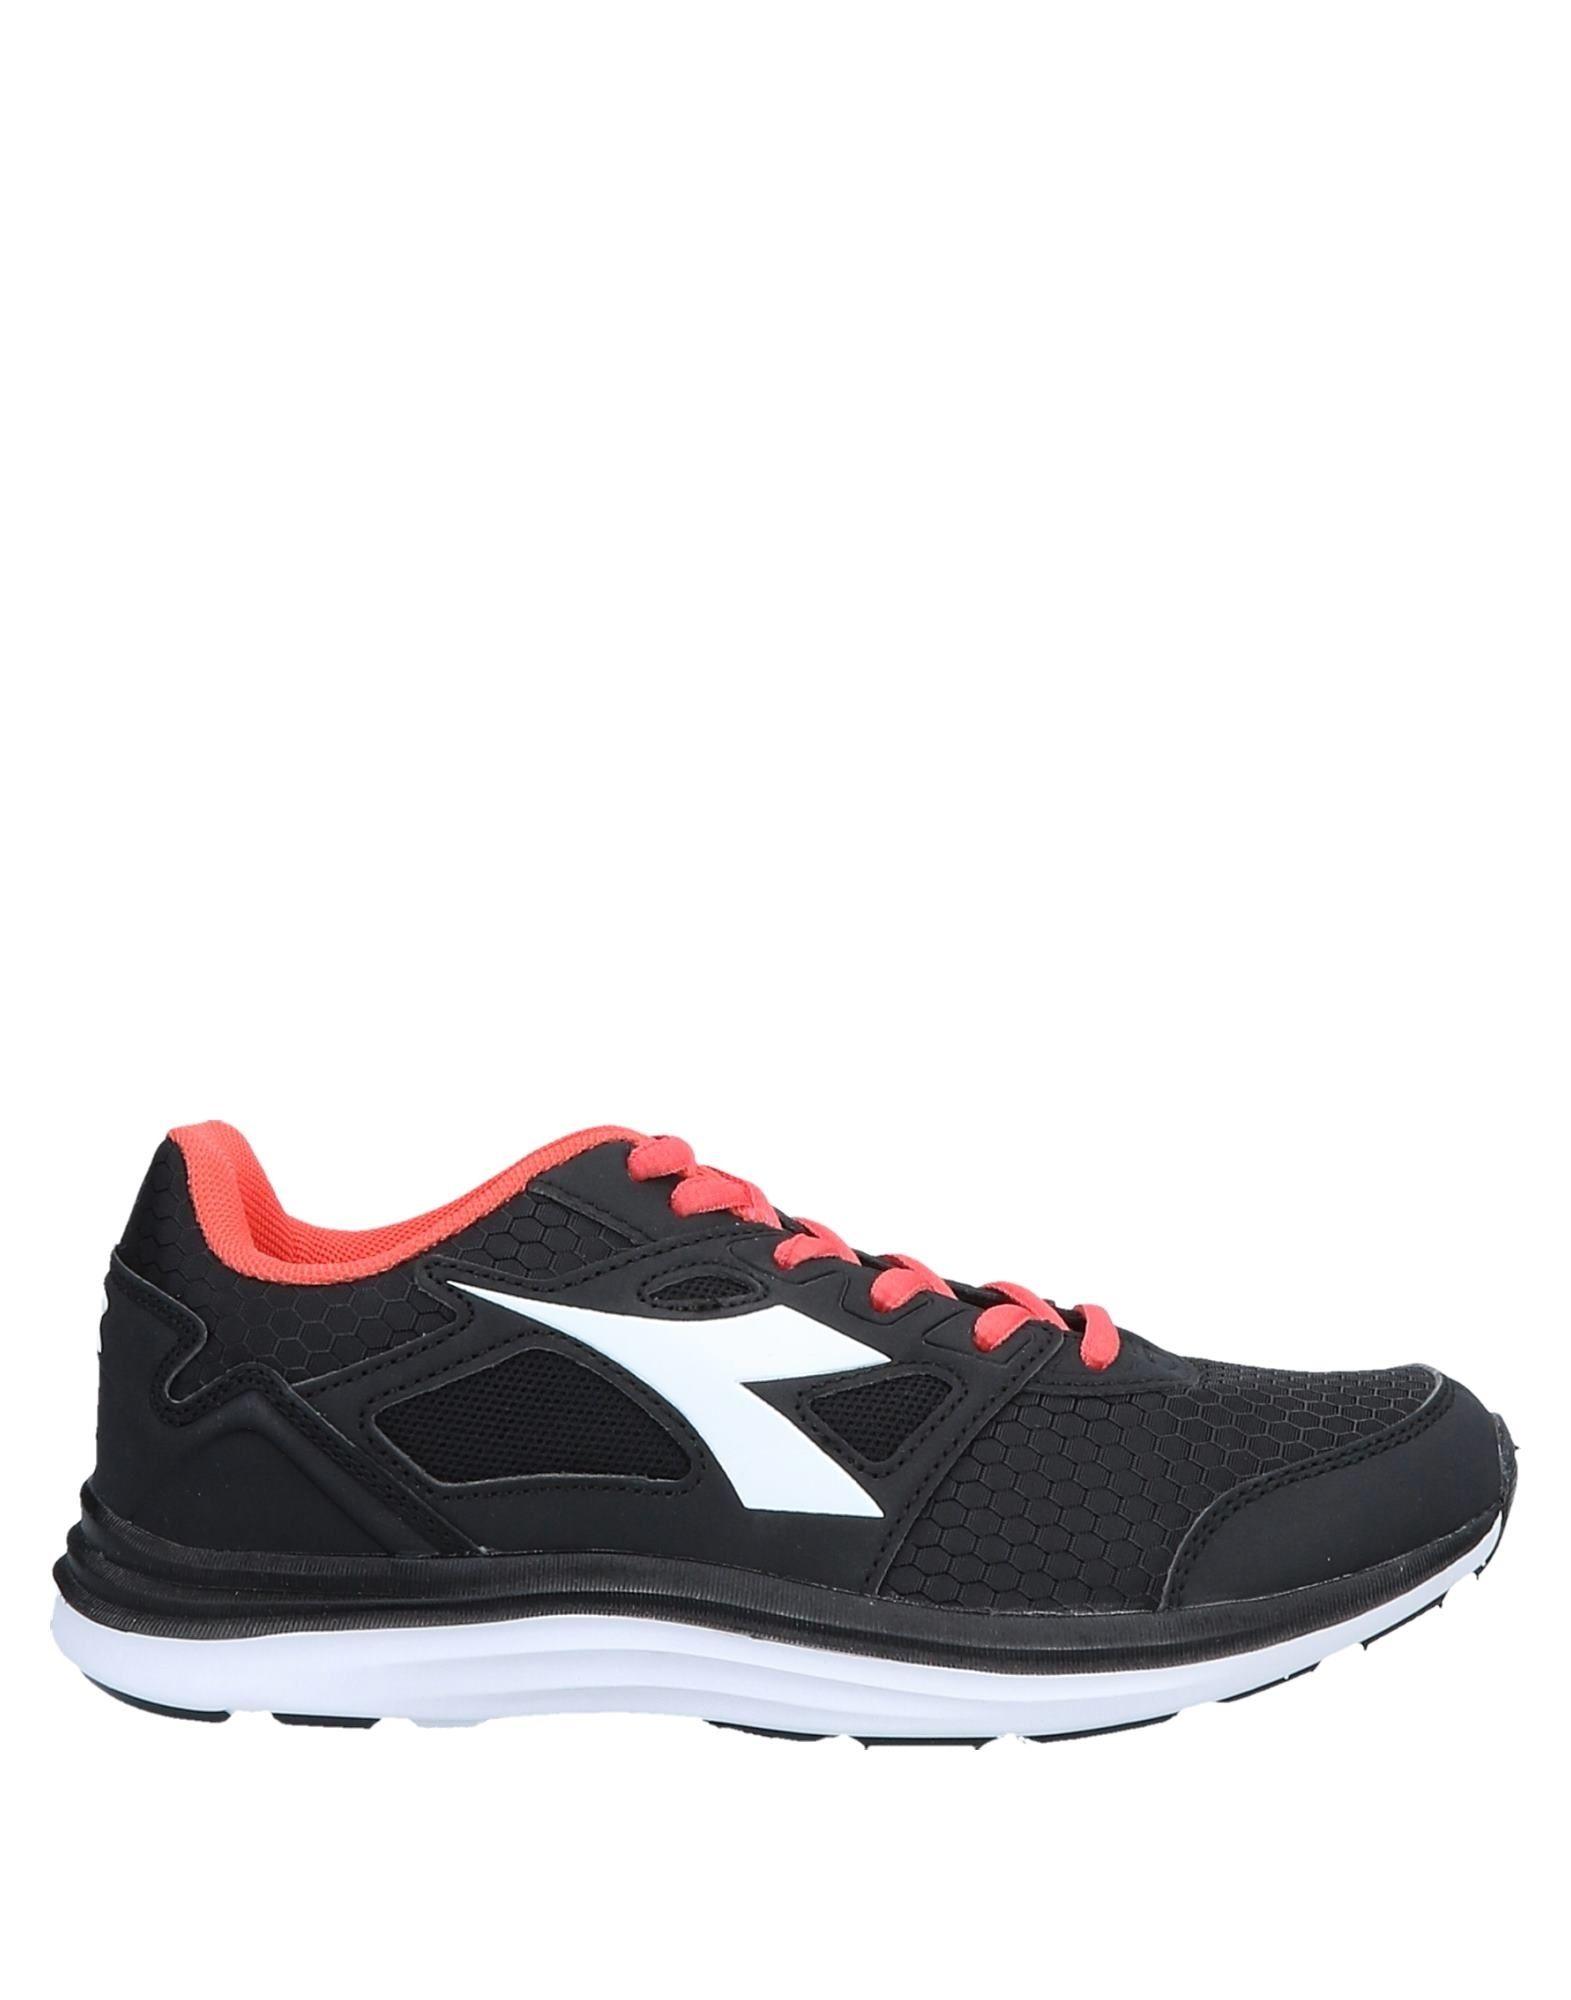 Diadora Sneakers - Women Diadora Sneakers - online on  Canada - Sneakers 11570453FB f20a08